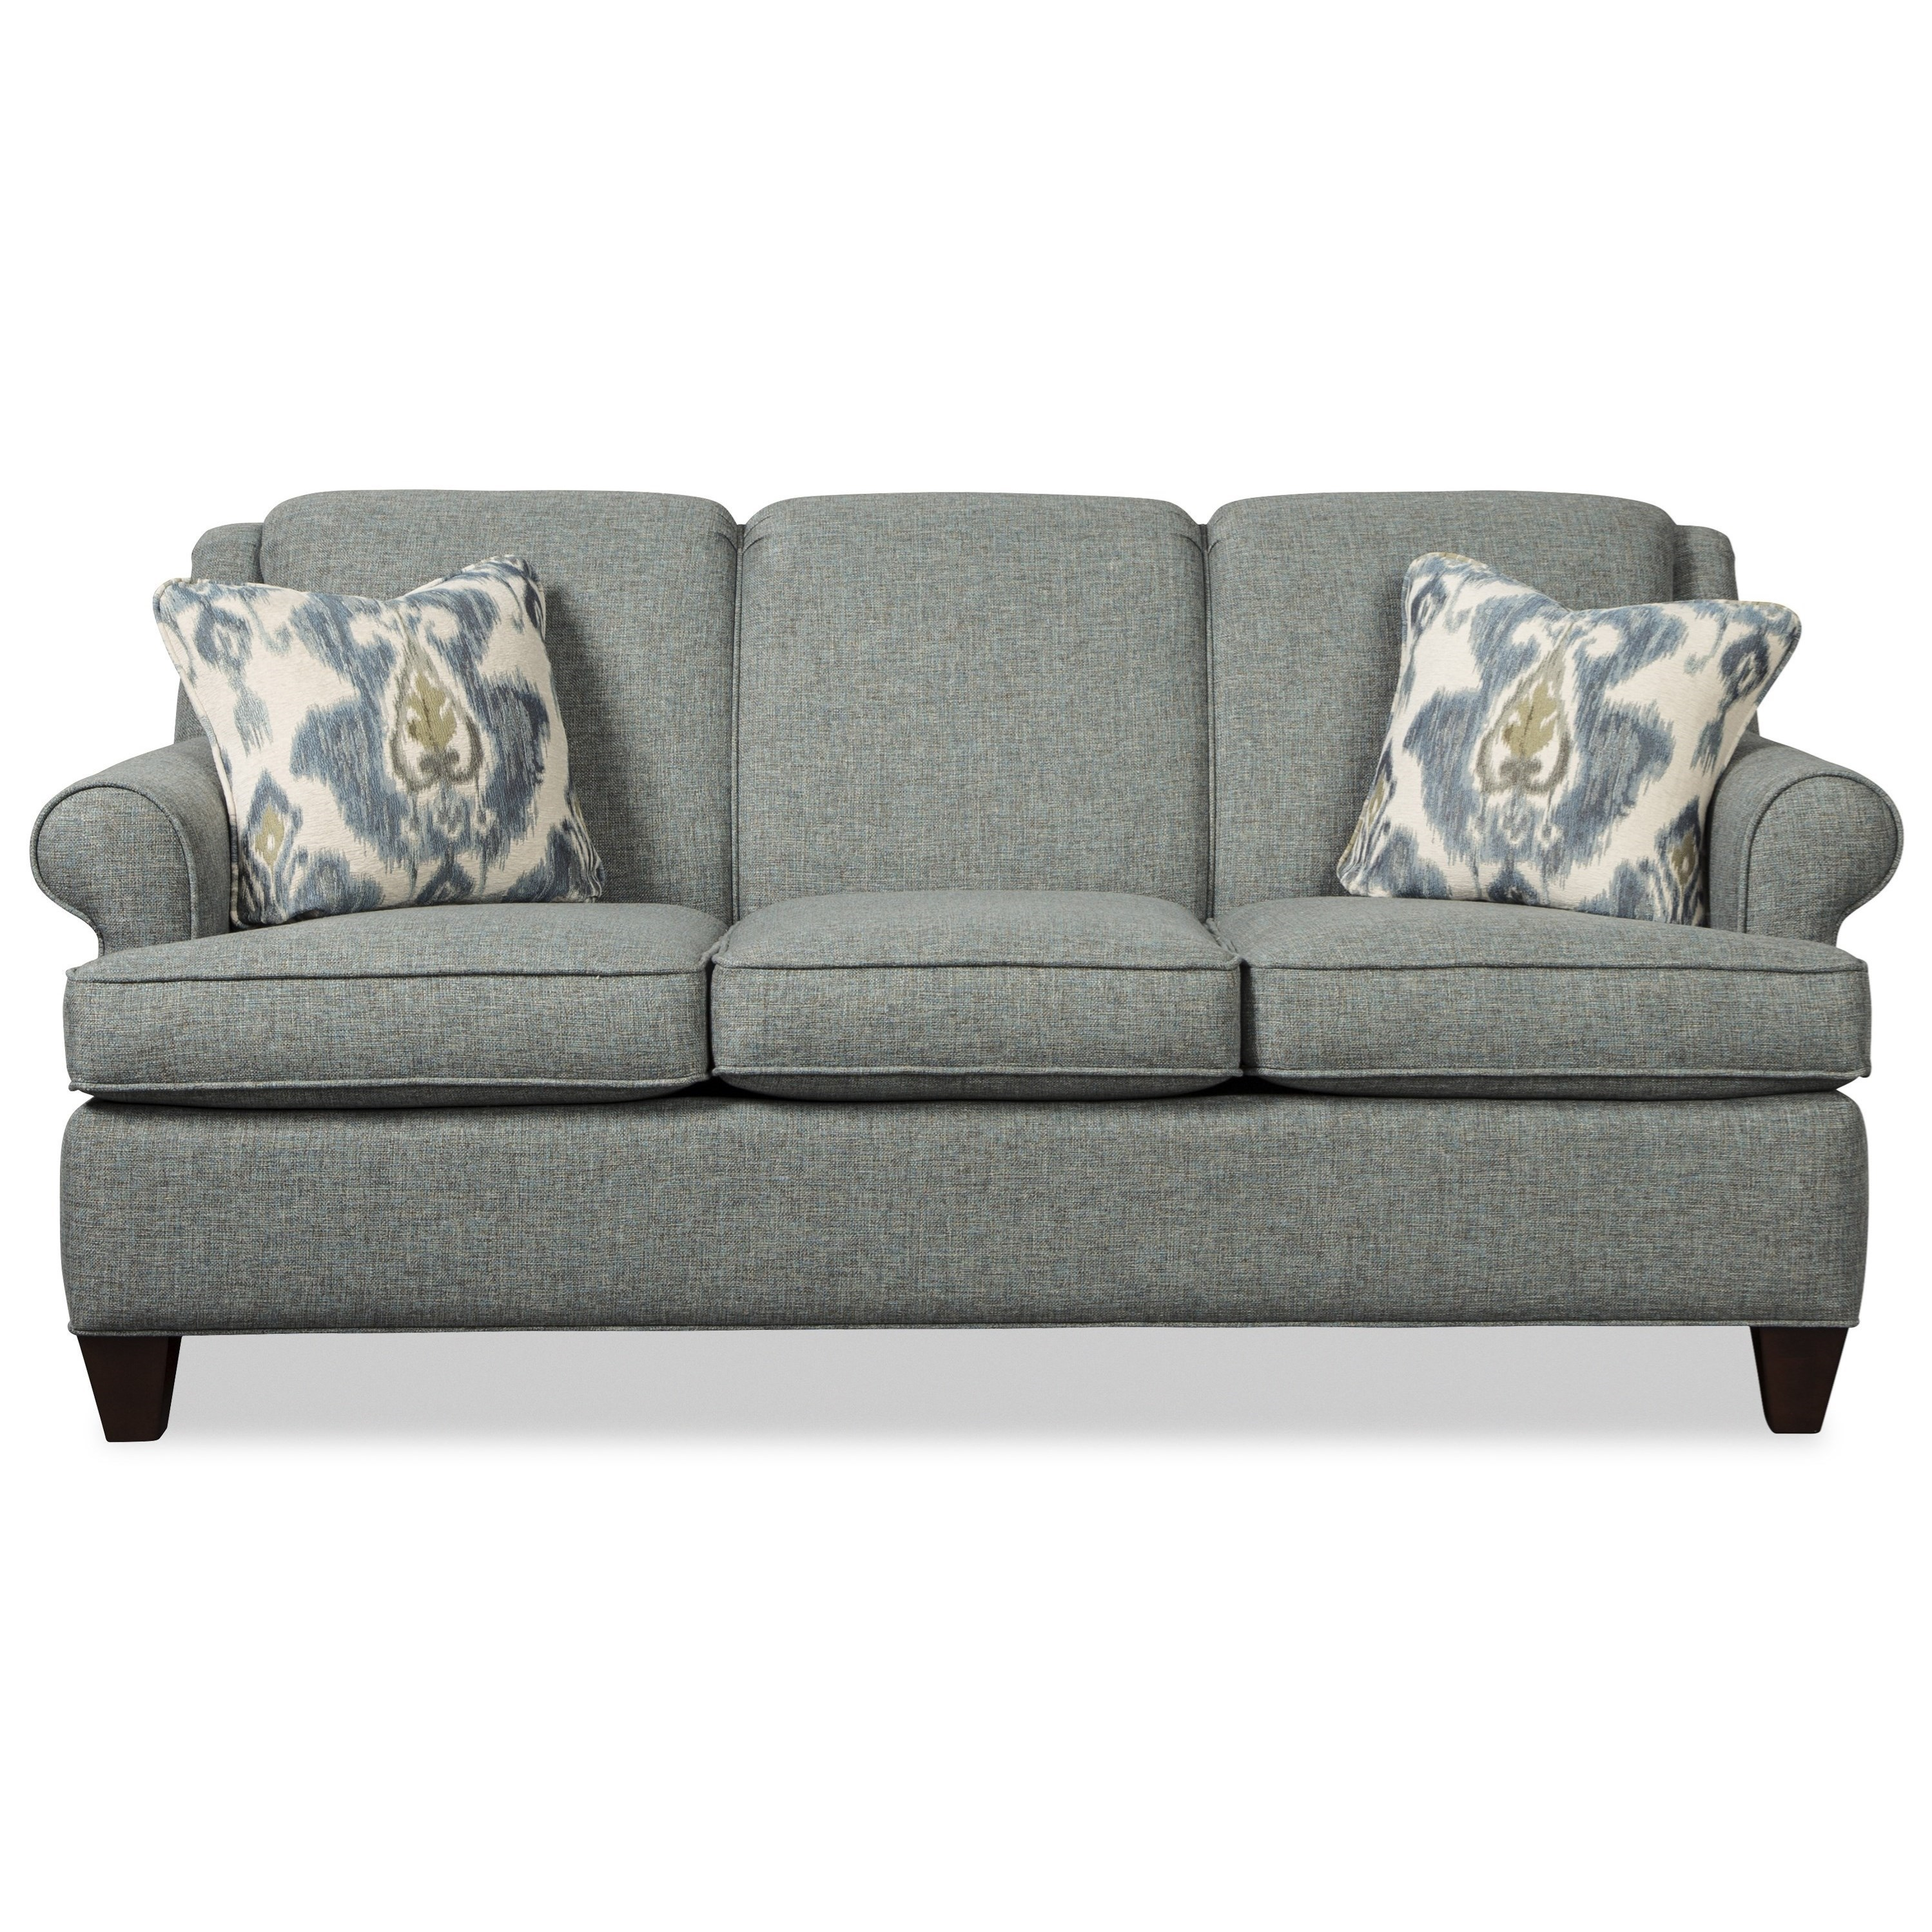 Craftmaster 781850Full Size Sleeper Sofa ...